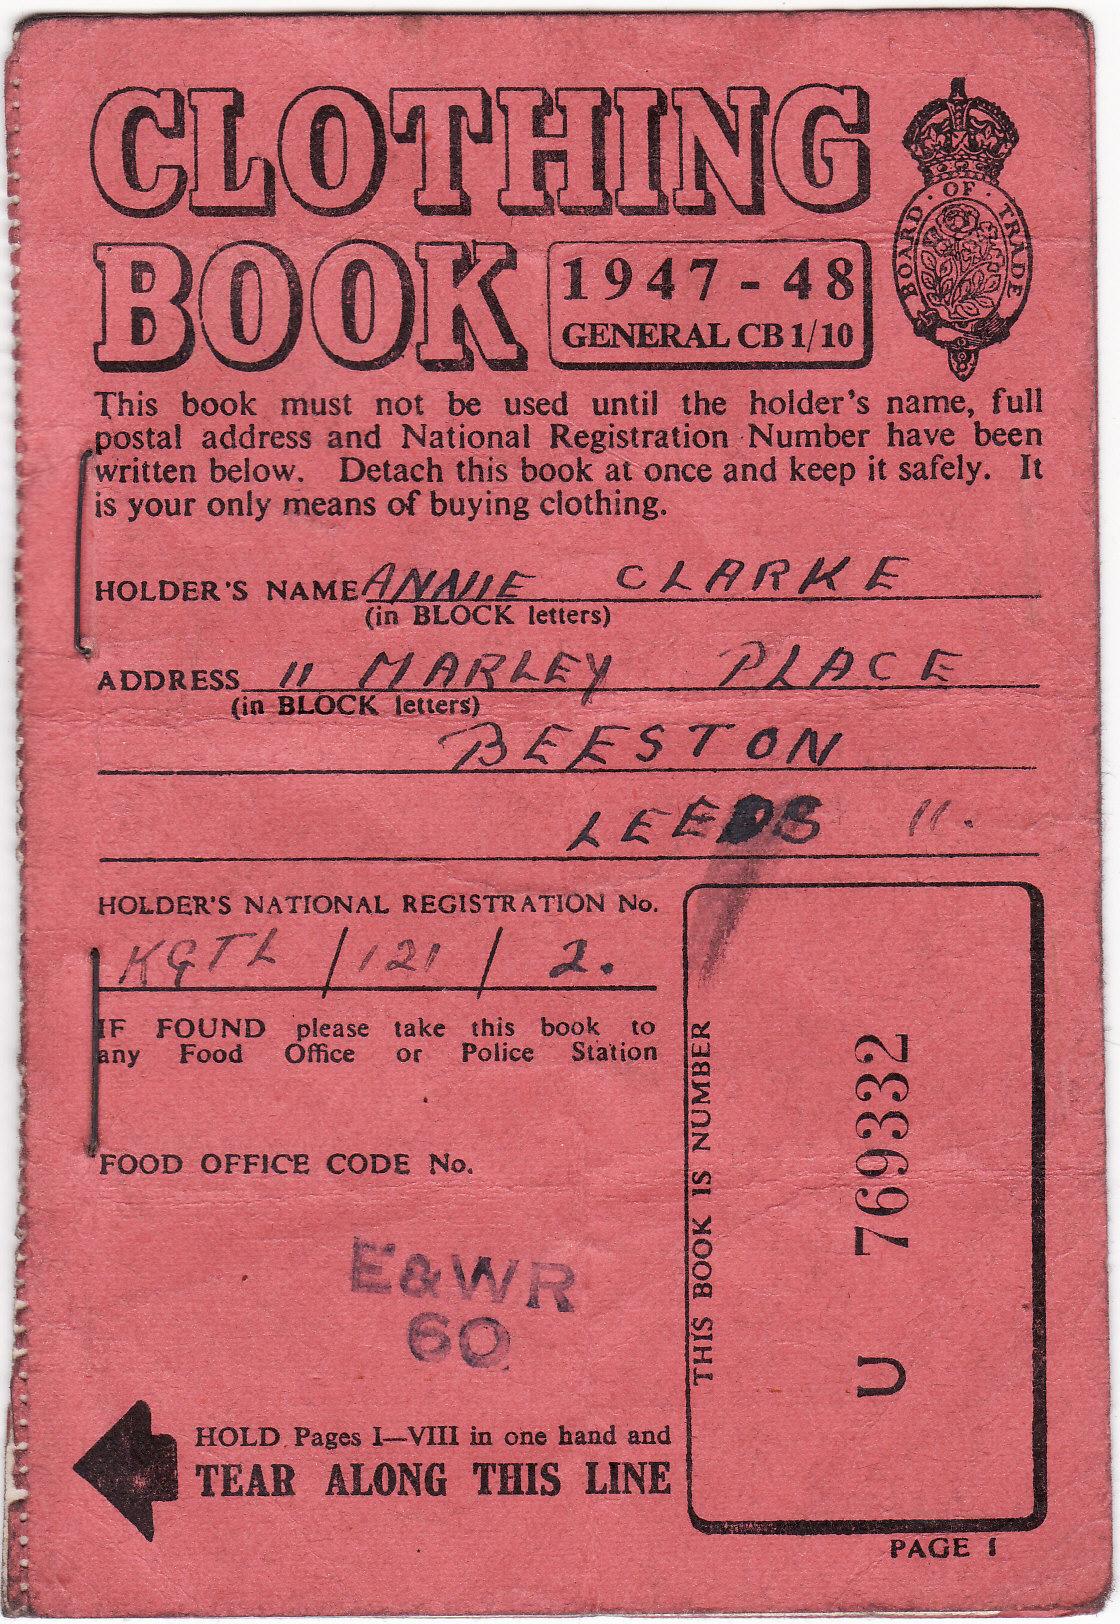 WW2 Clothing Book